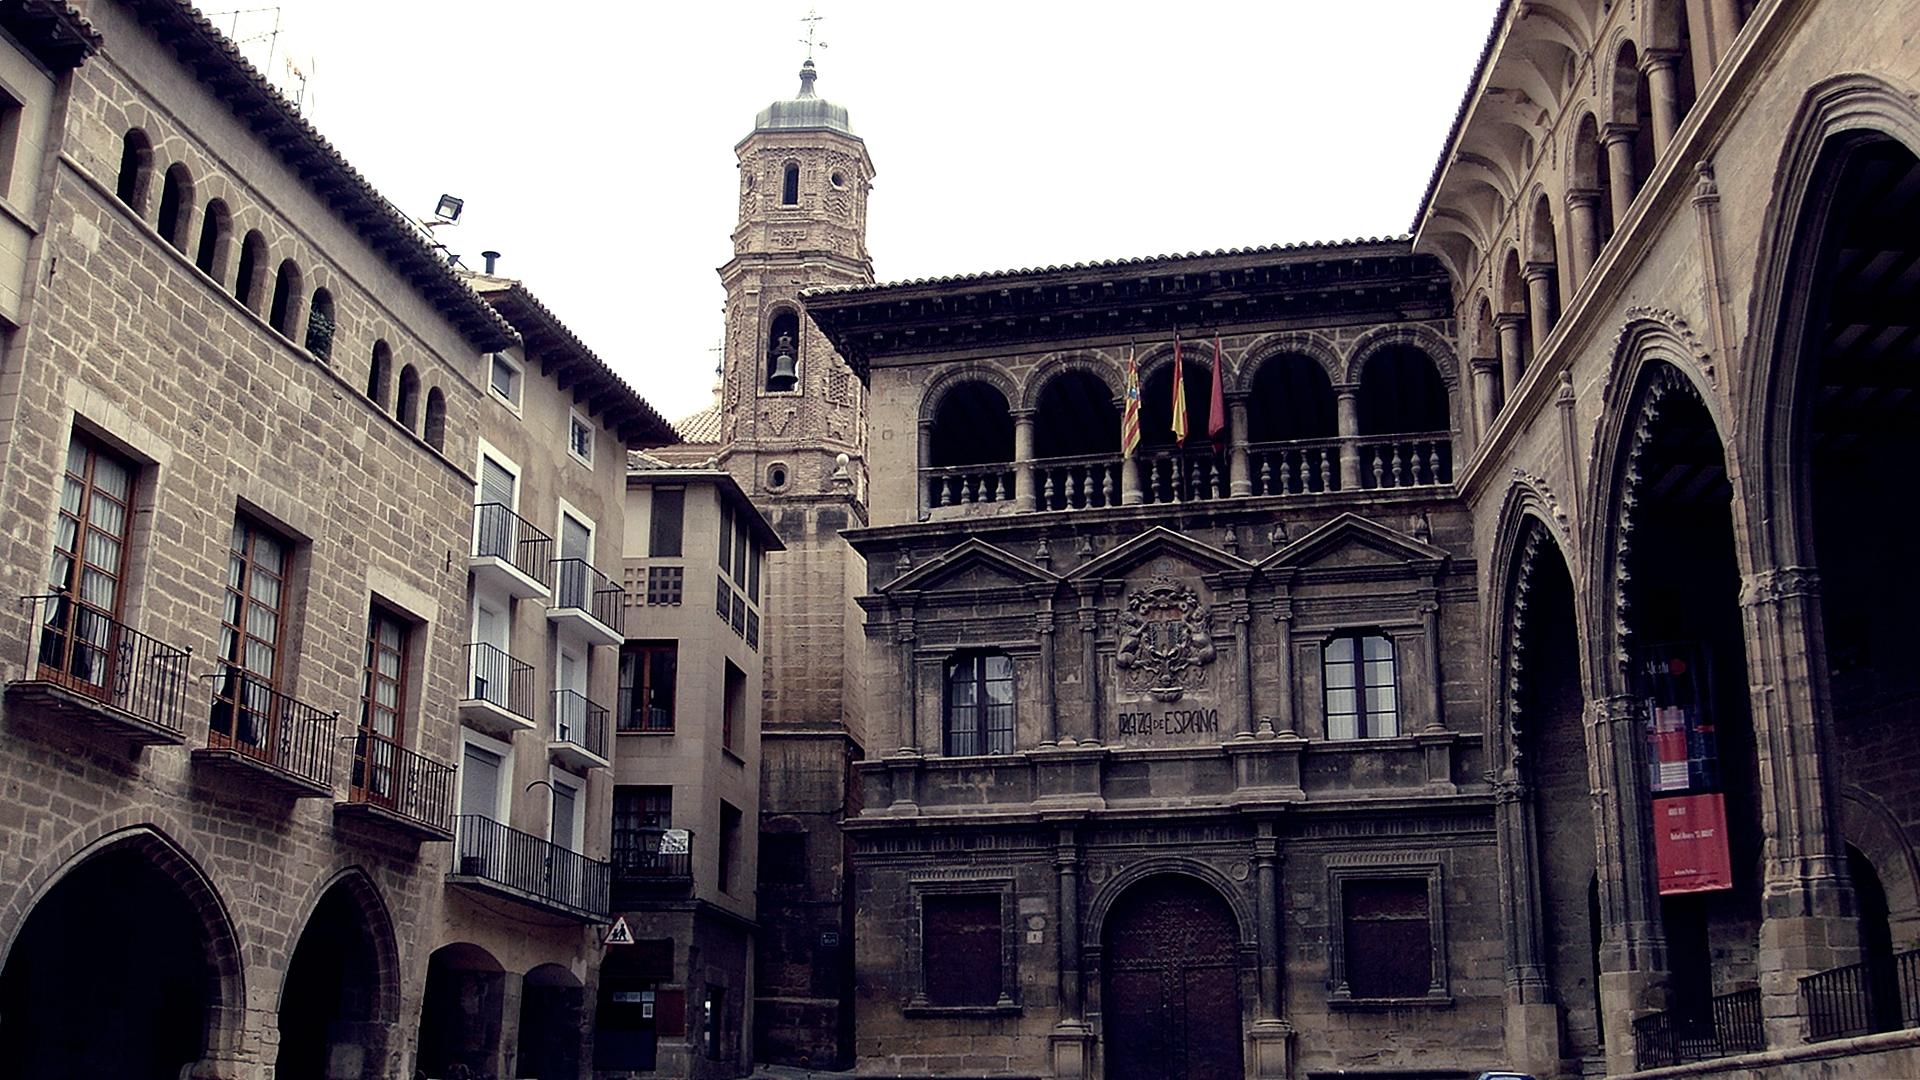 Alcaniz Spain  City pictures : ... :Plaza de España en Alcañiz, Teruel Spain Wikimedia Commons